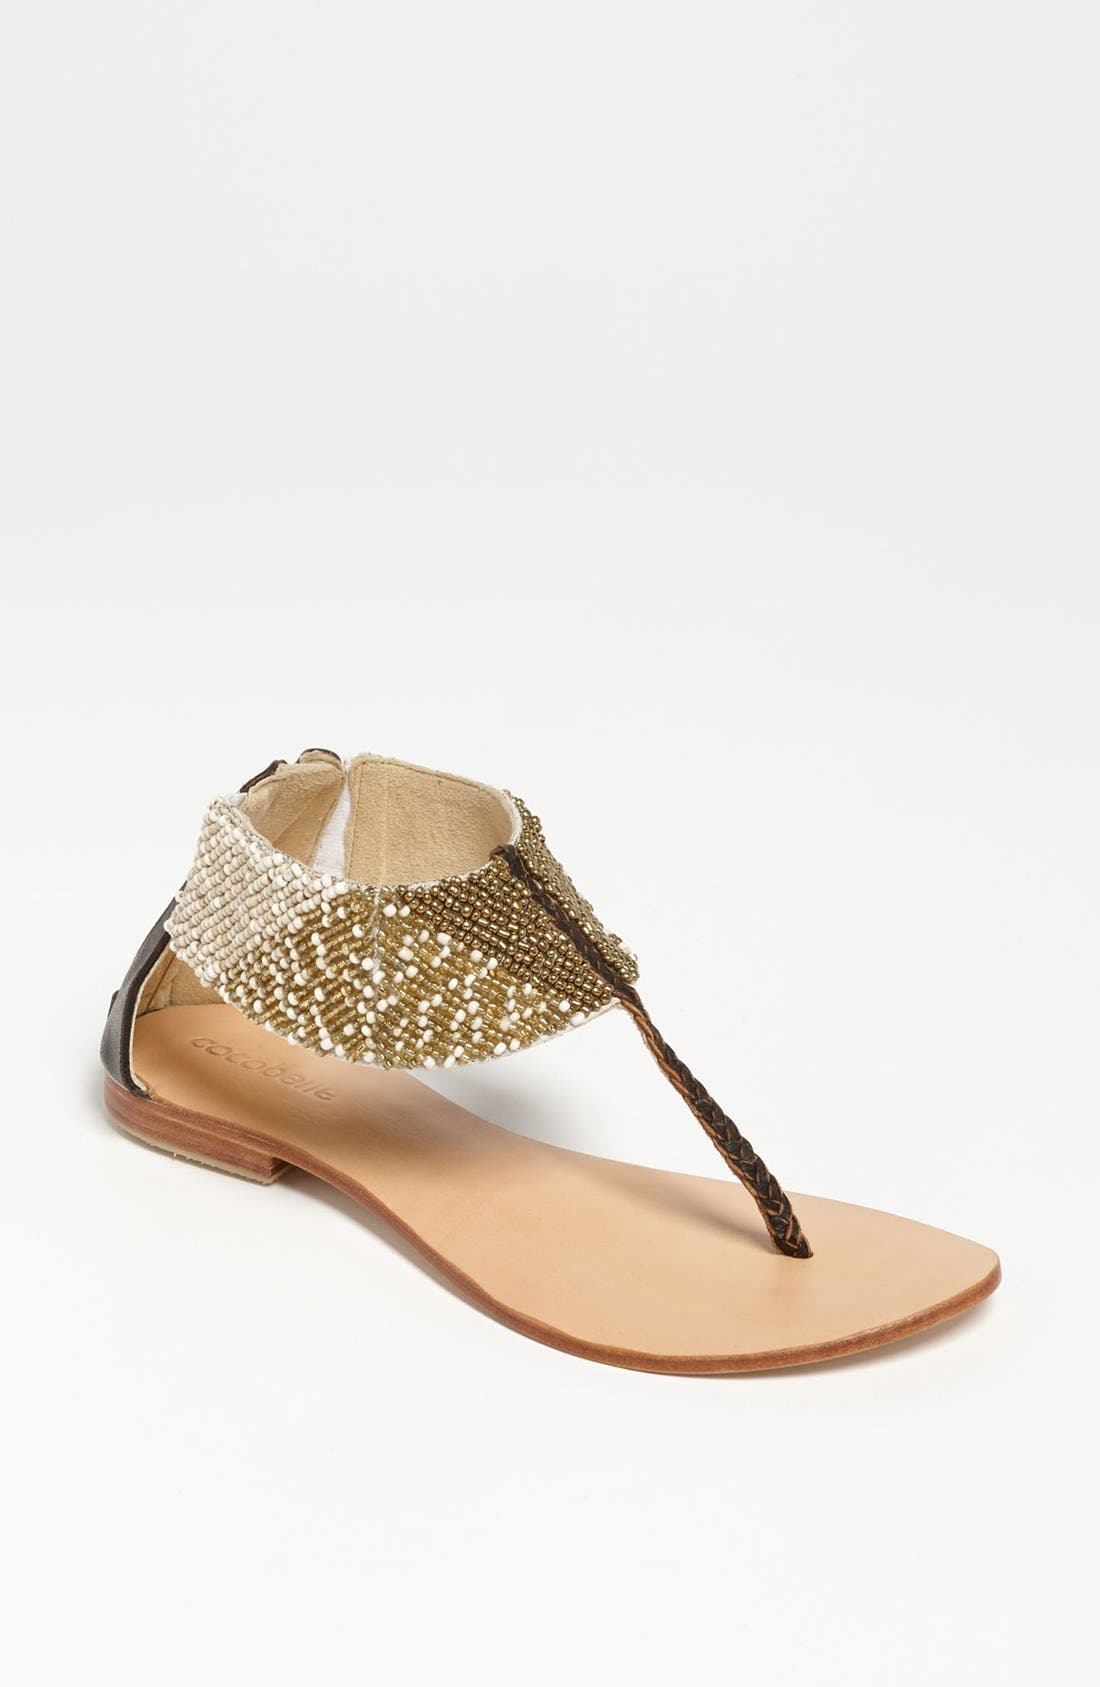 Main Image - Cocobelle 'Coco' Sandal